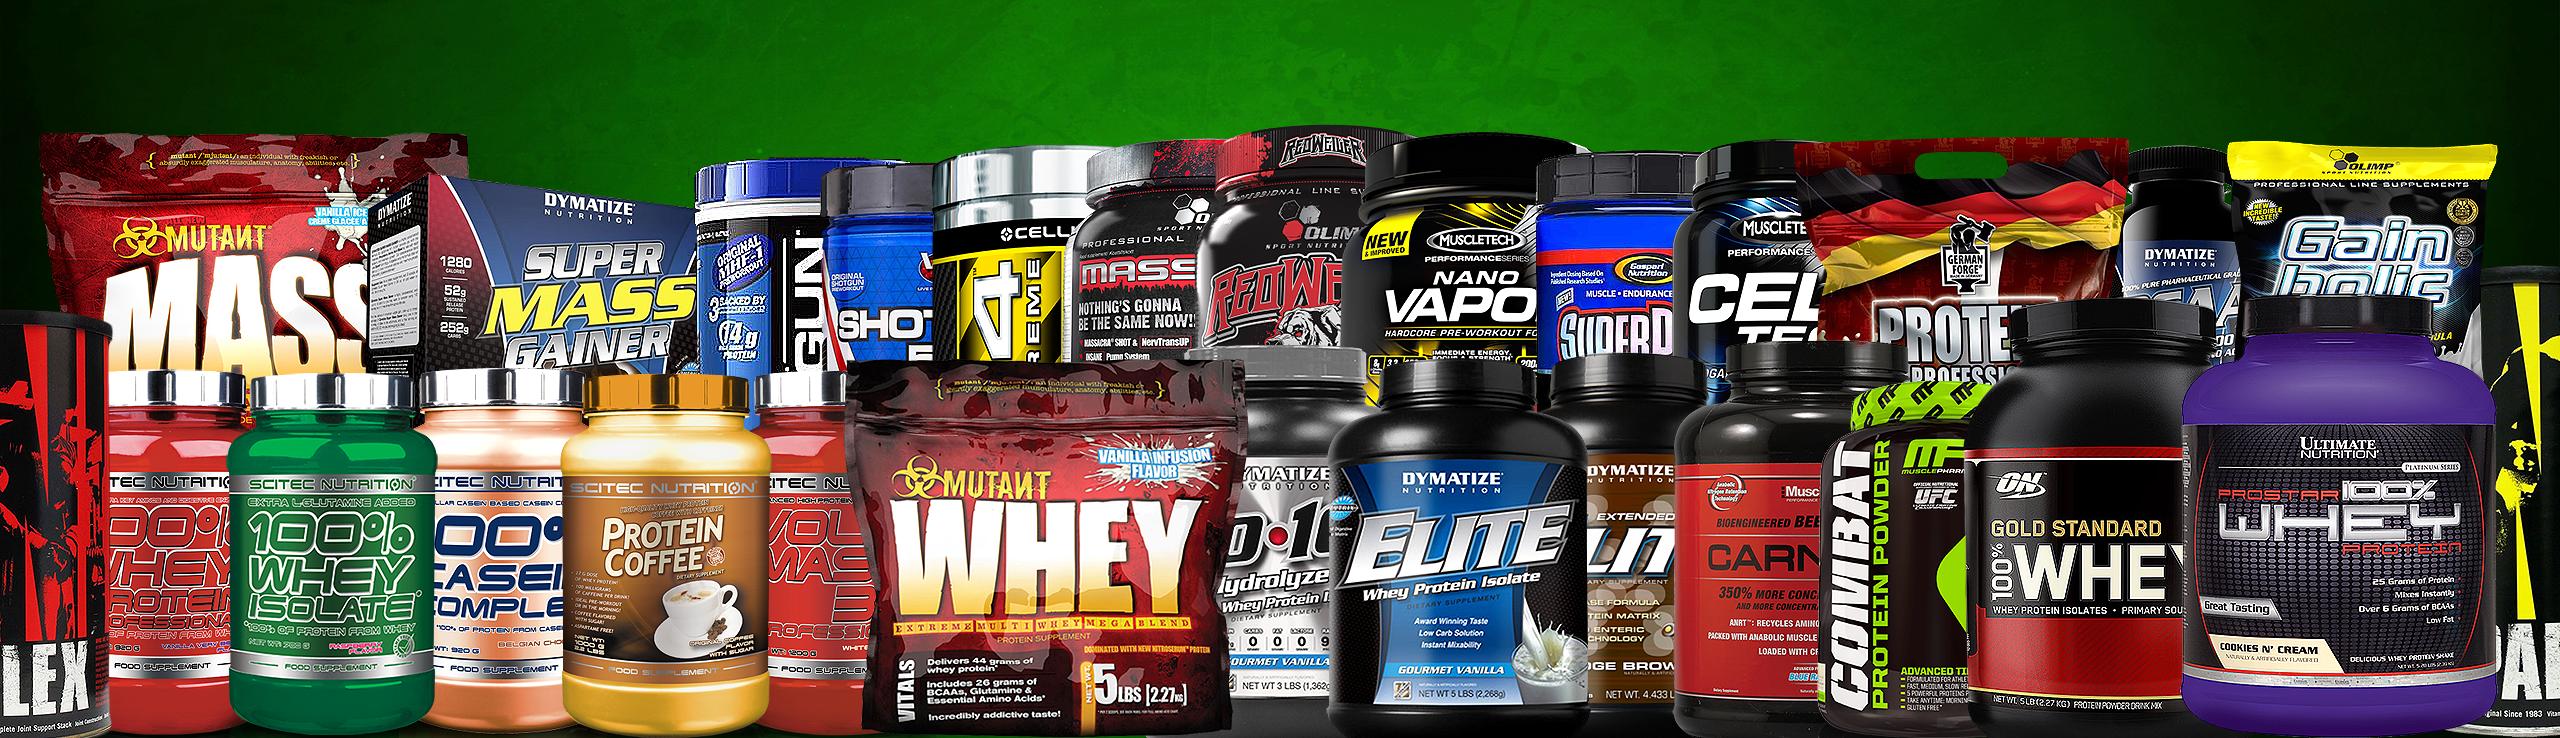 Proteini.Sportski suplementi.